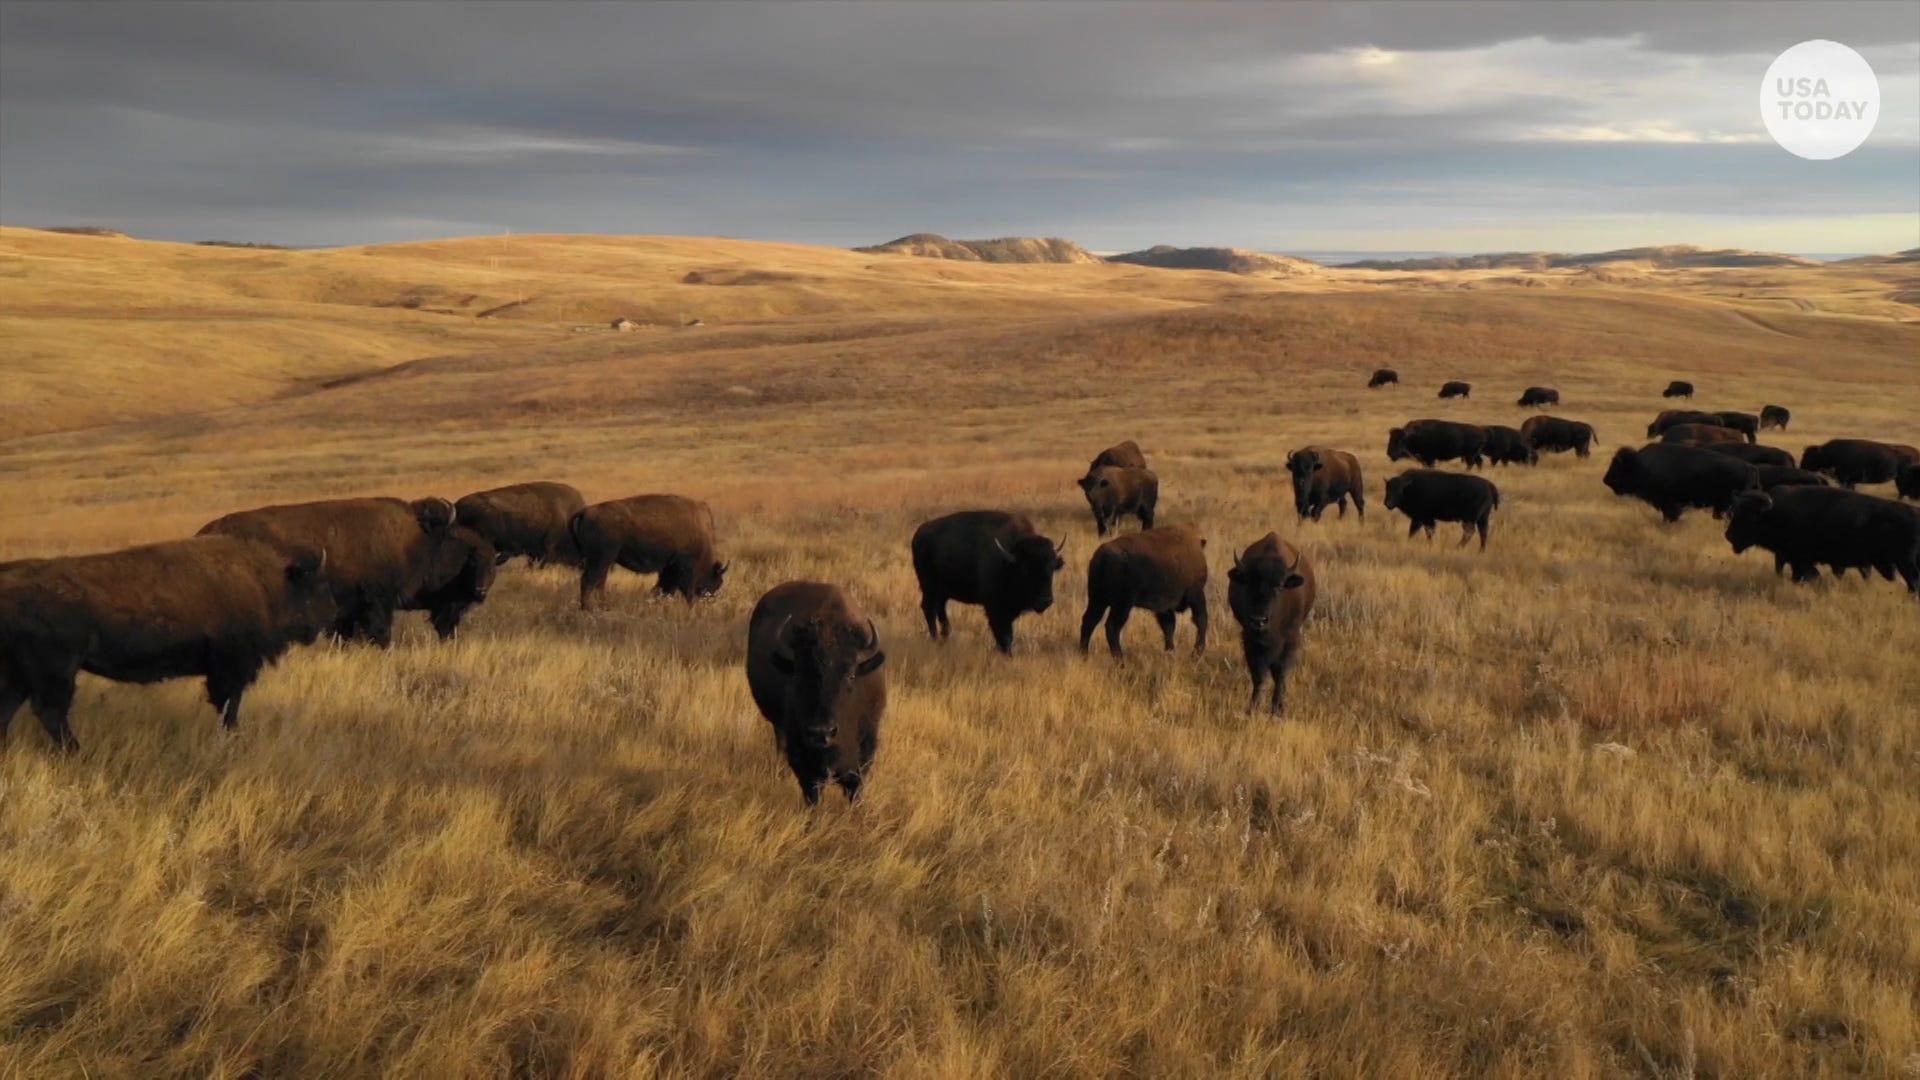 Travel back in time in wild, wonderful South Dakota